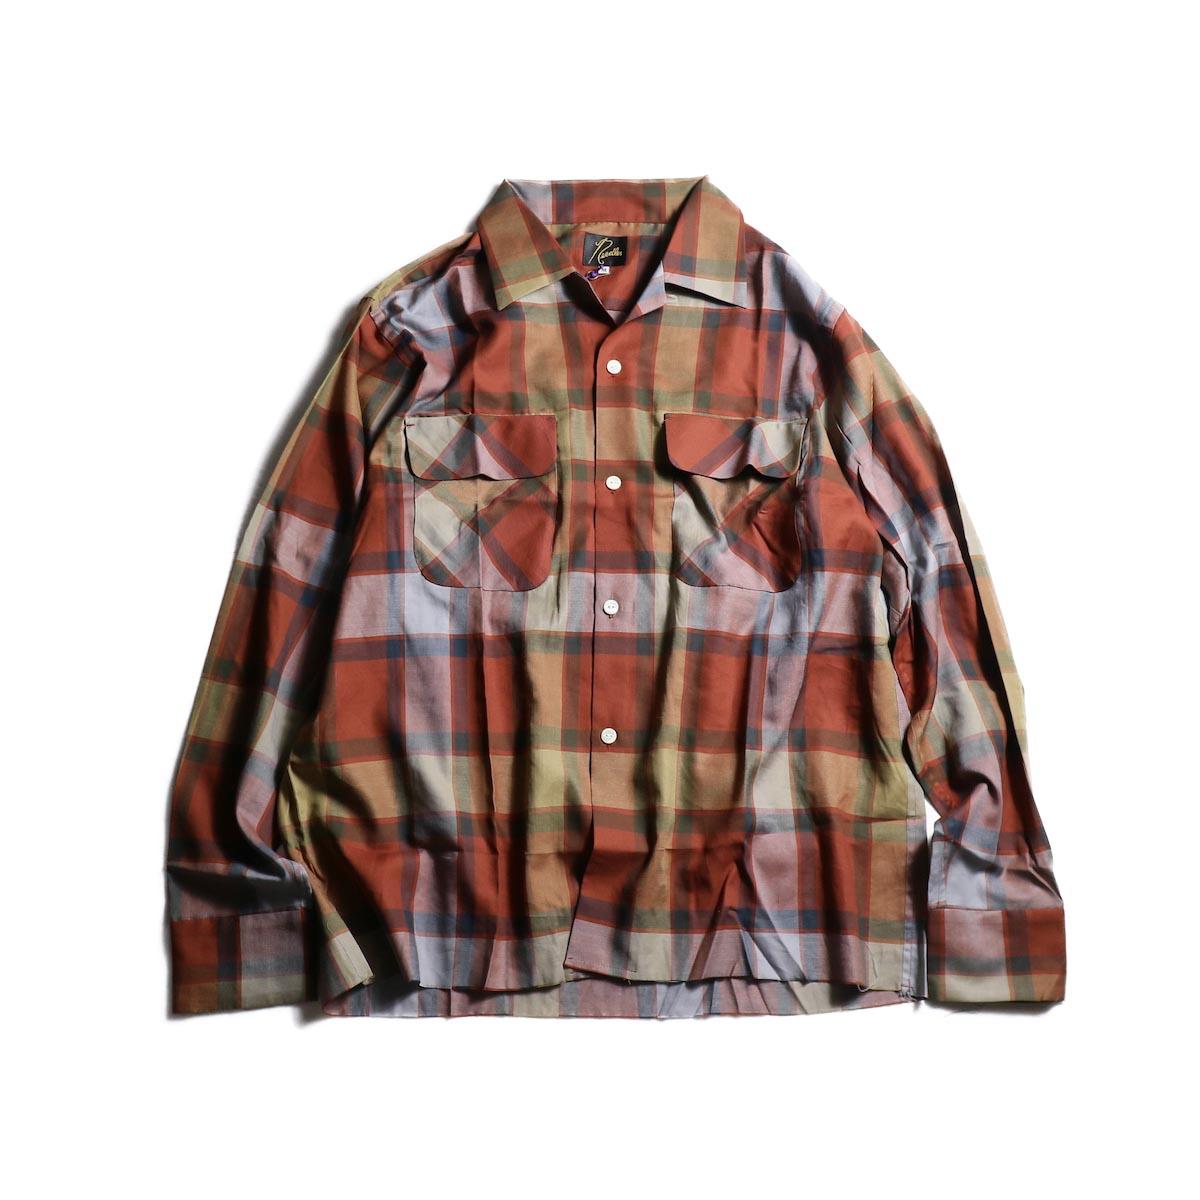 NEEDLES / Cut-Off Bottom Classic Shirt -C/R/T Plaid Twill (Rust)